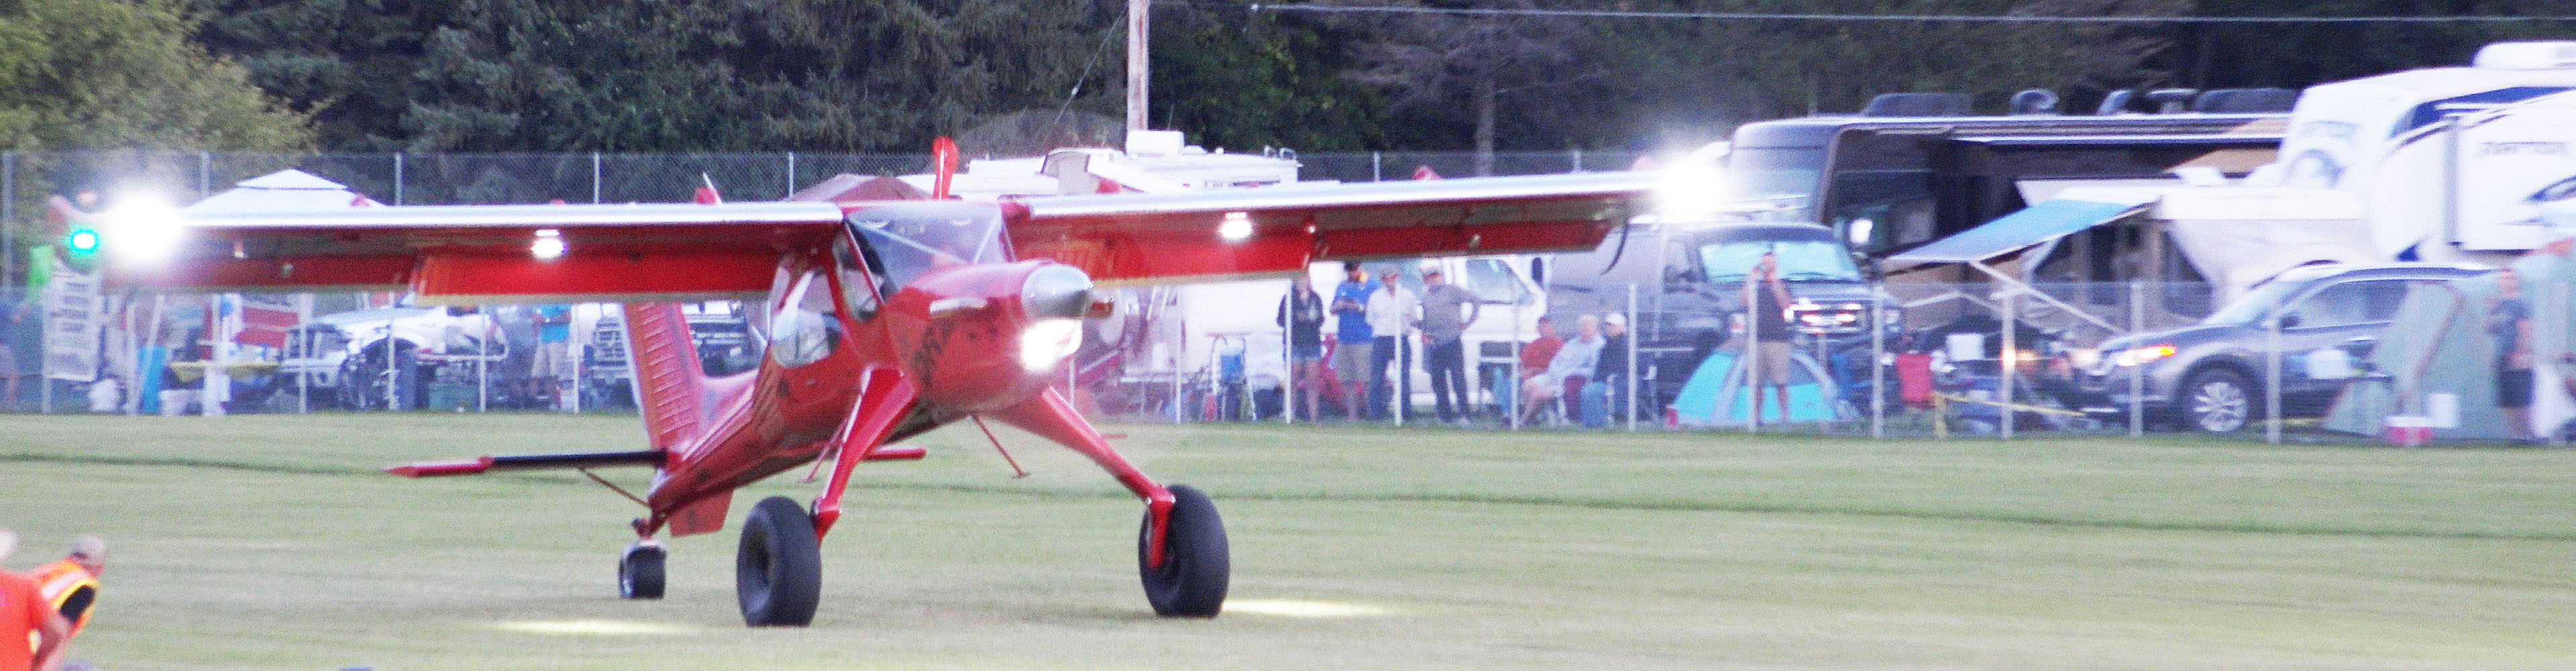 Hangar 7 Rainbow Aviation STOL Competition in 4K, AirVenture